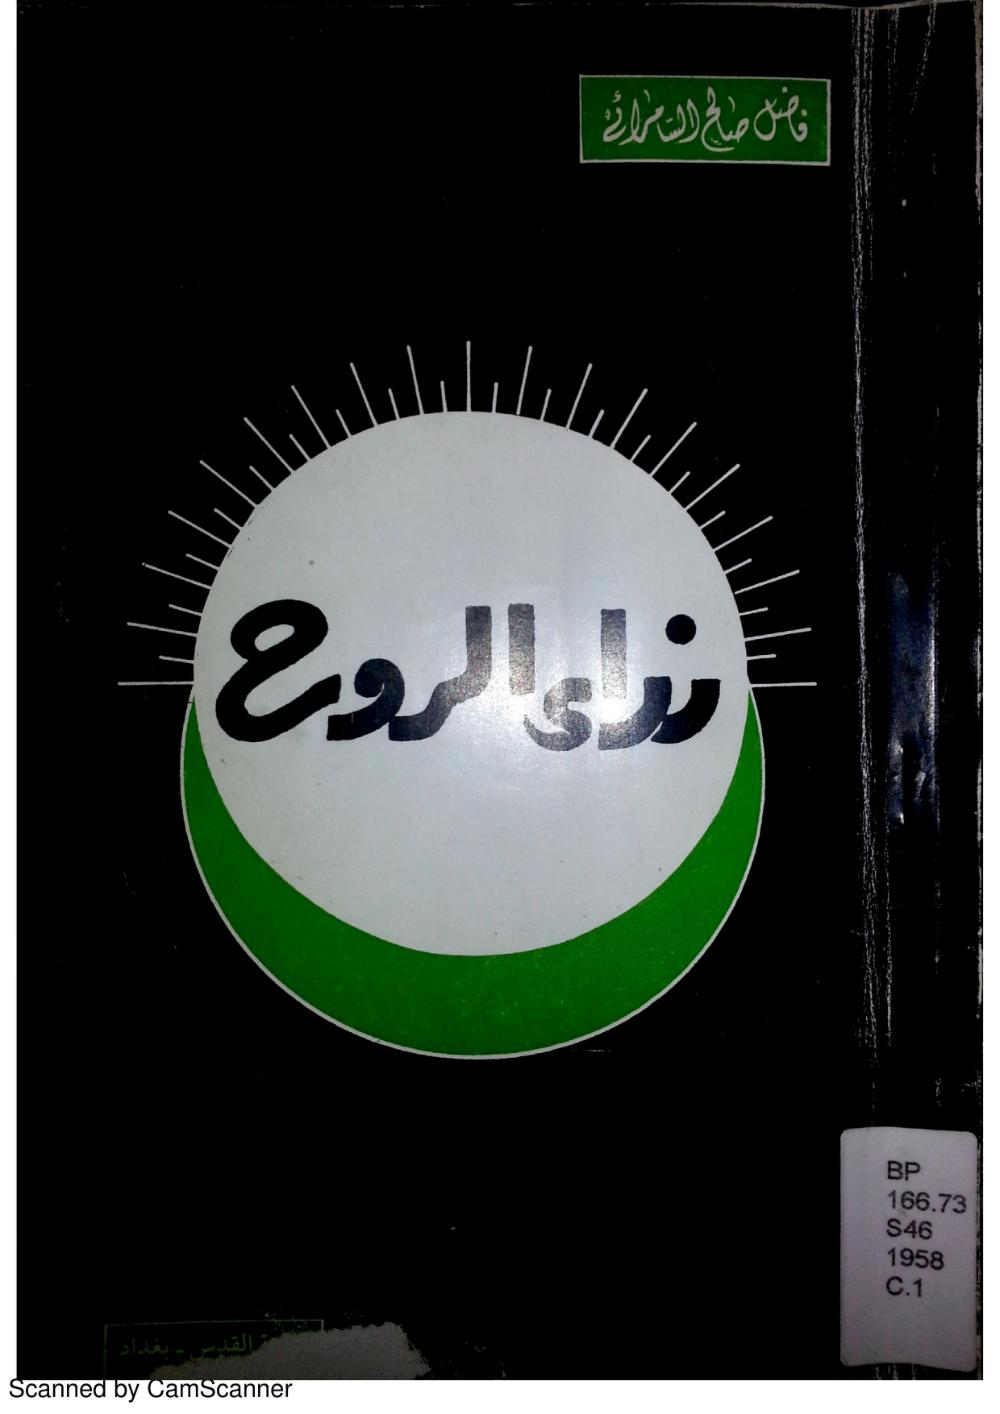 نداء الروح د فاضل السامرائي أبو شوق Free Download Borrow And Streaming Internet Archive Tech Company Logos Internet Archive Logos